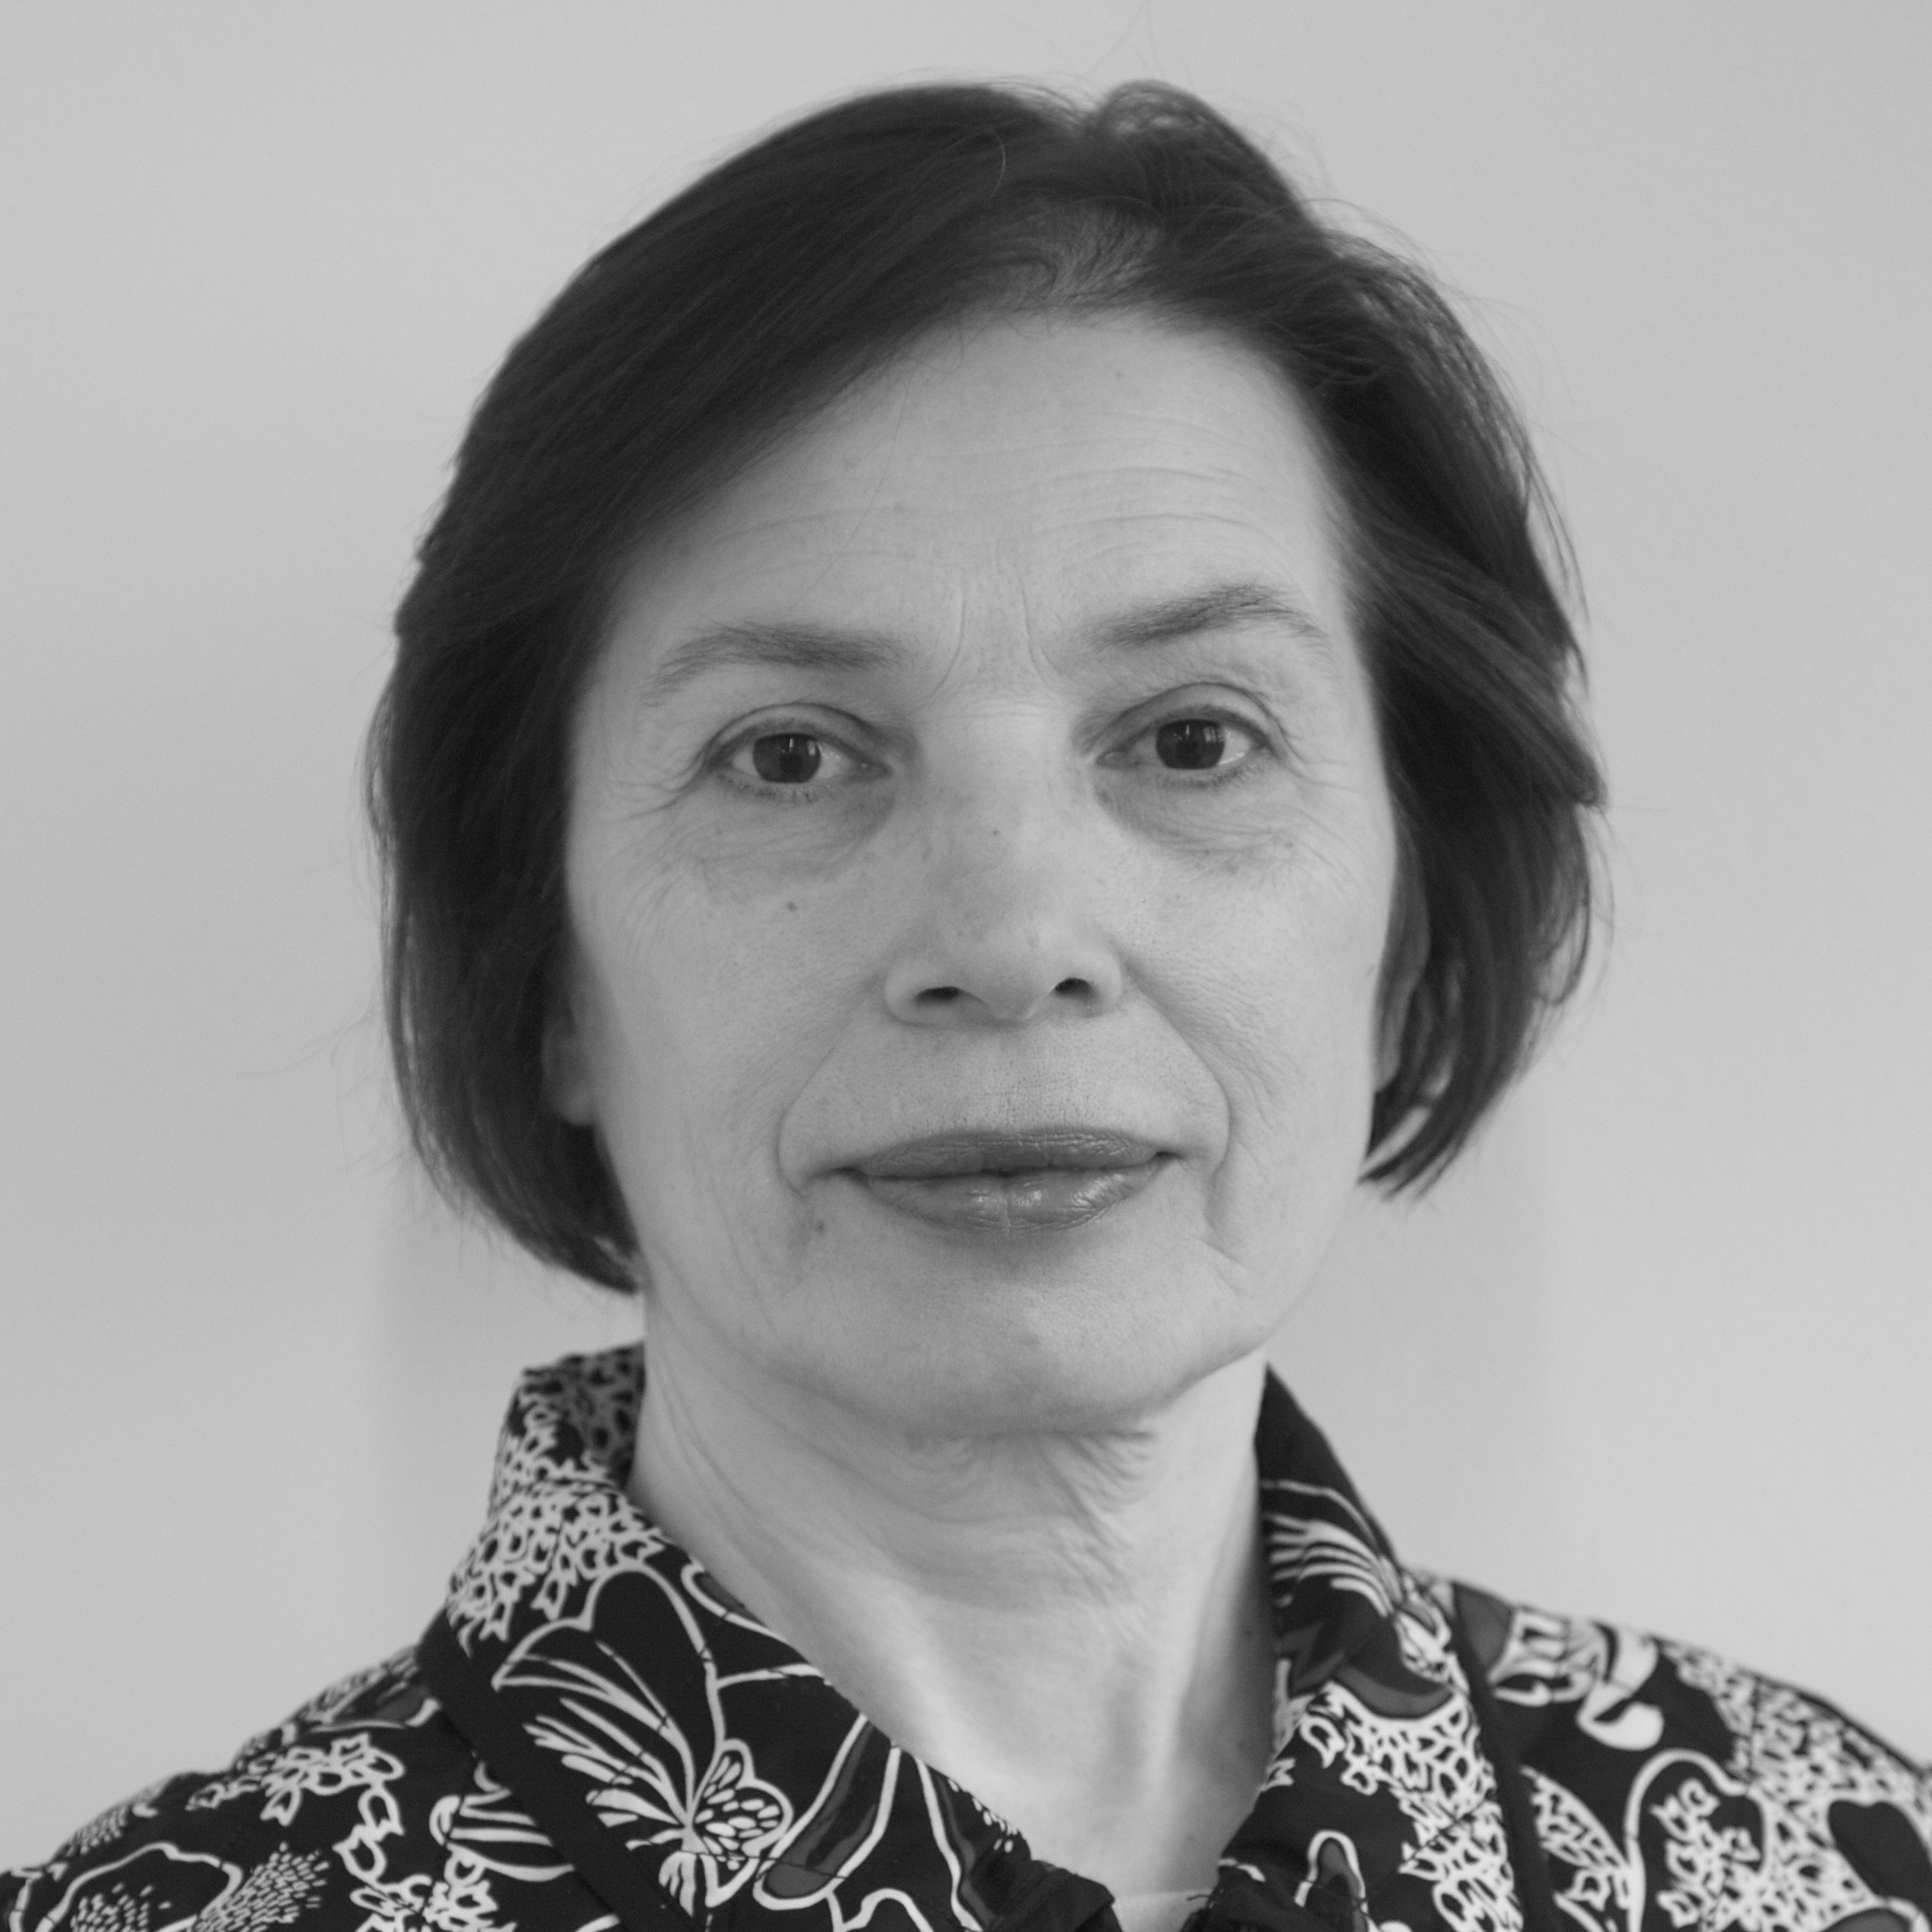 Olga Shulgina